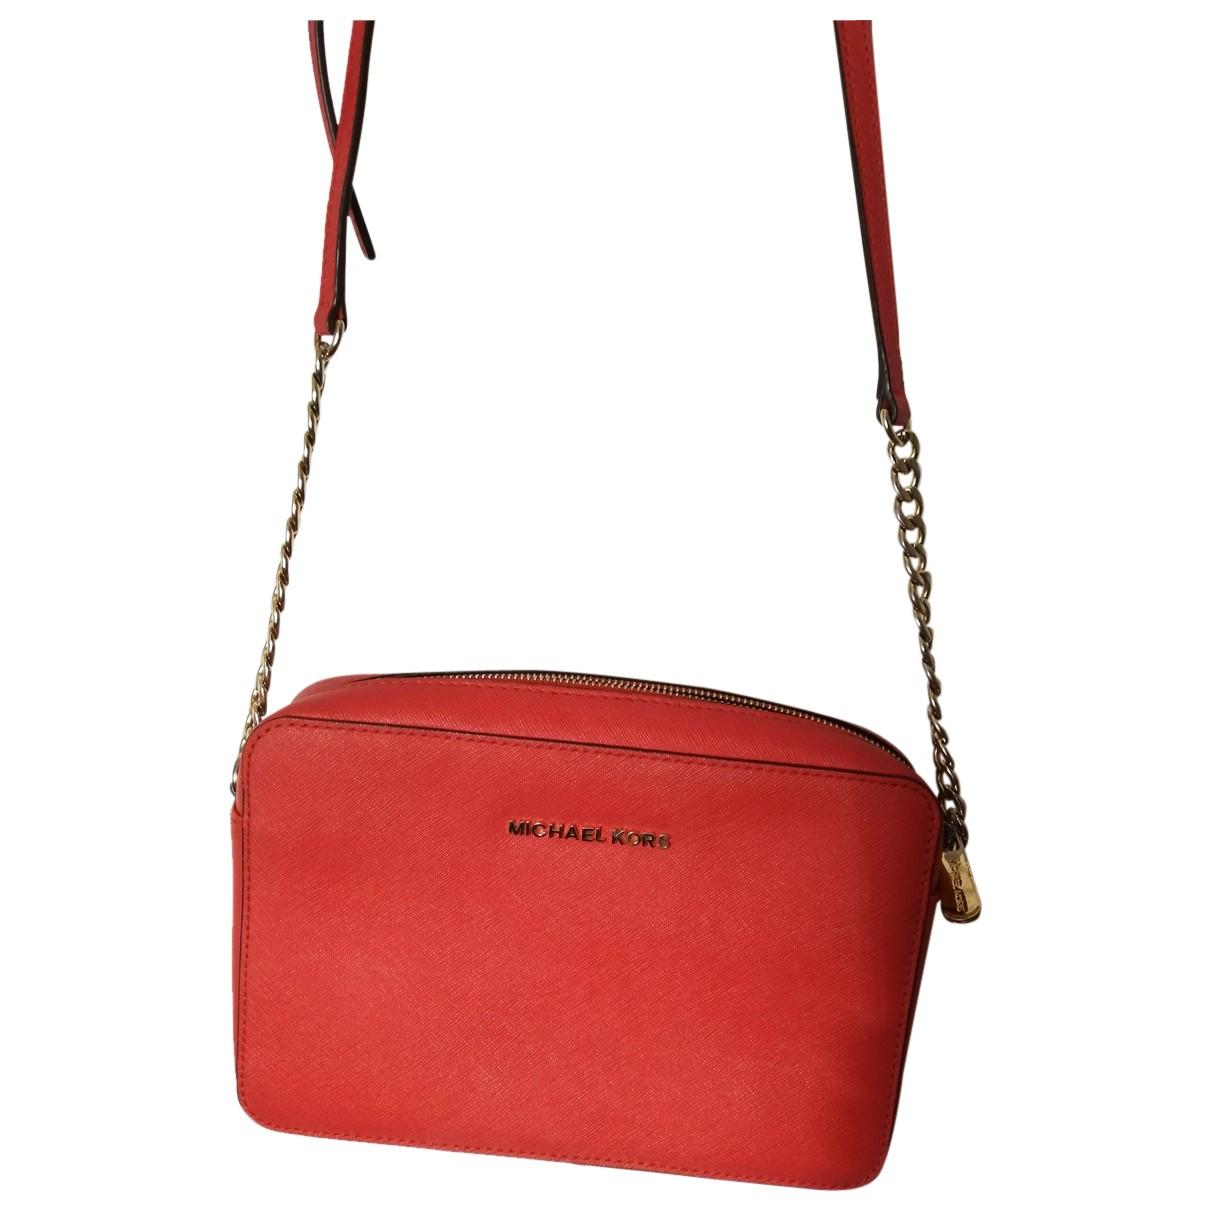 Michael Kors Jet Set Orange Leather Clutch bag for Women N